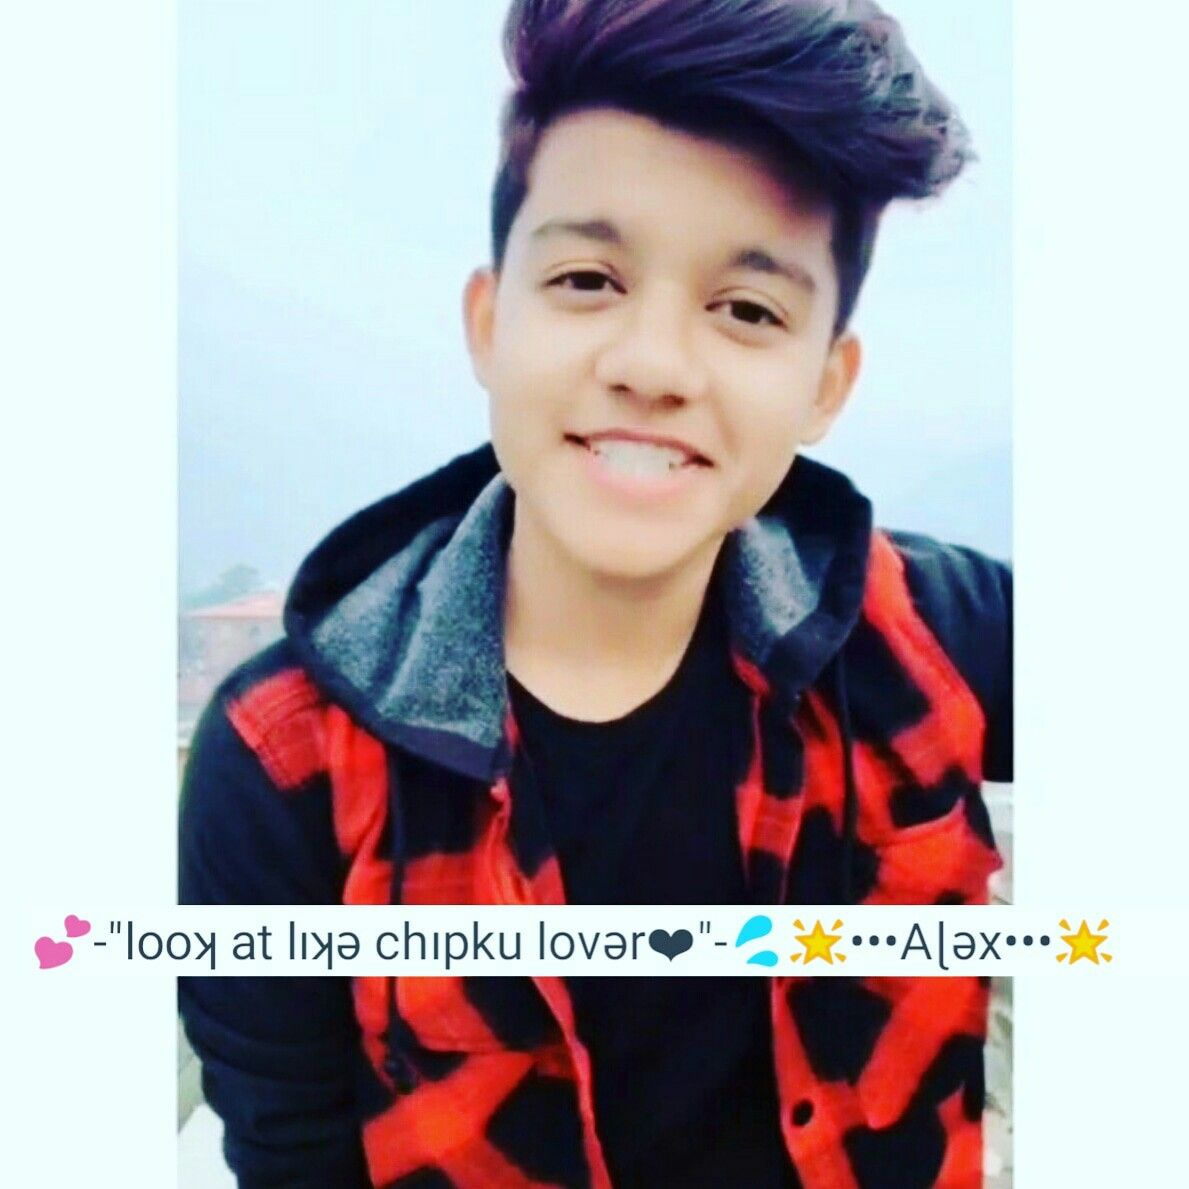 Boy x pic Adamo Super7 On Twitter The Sexy Boy X Star Kikilou Http T Co 7wr0akkmsk